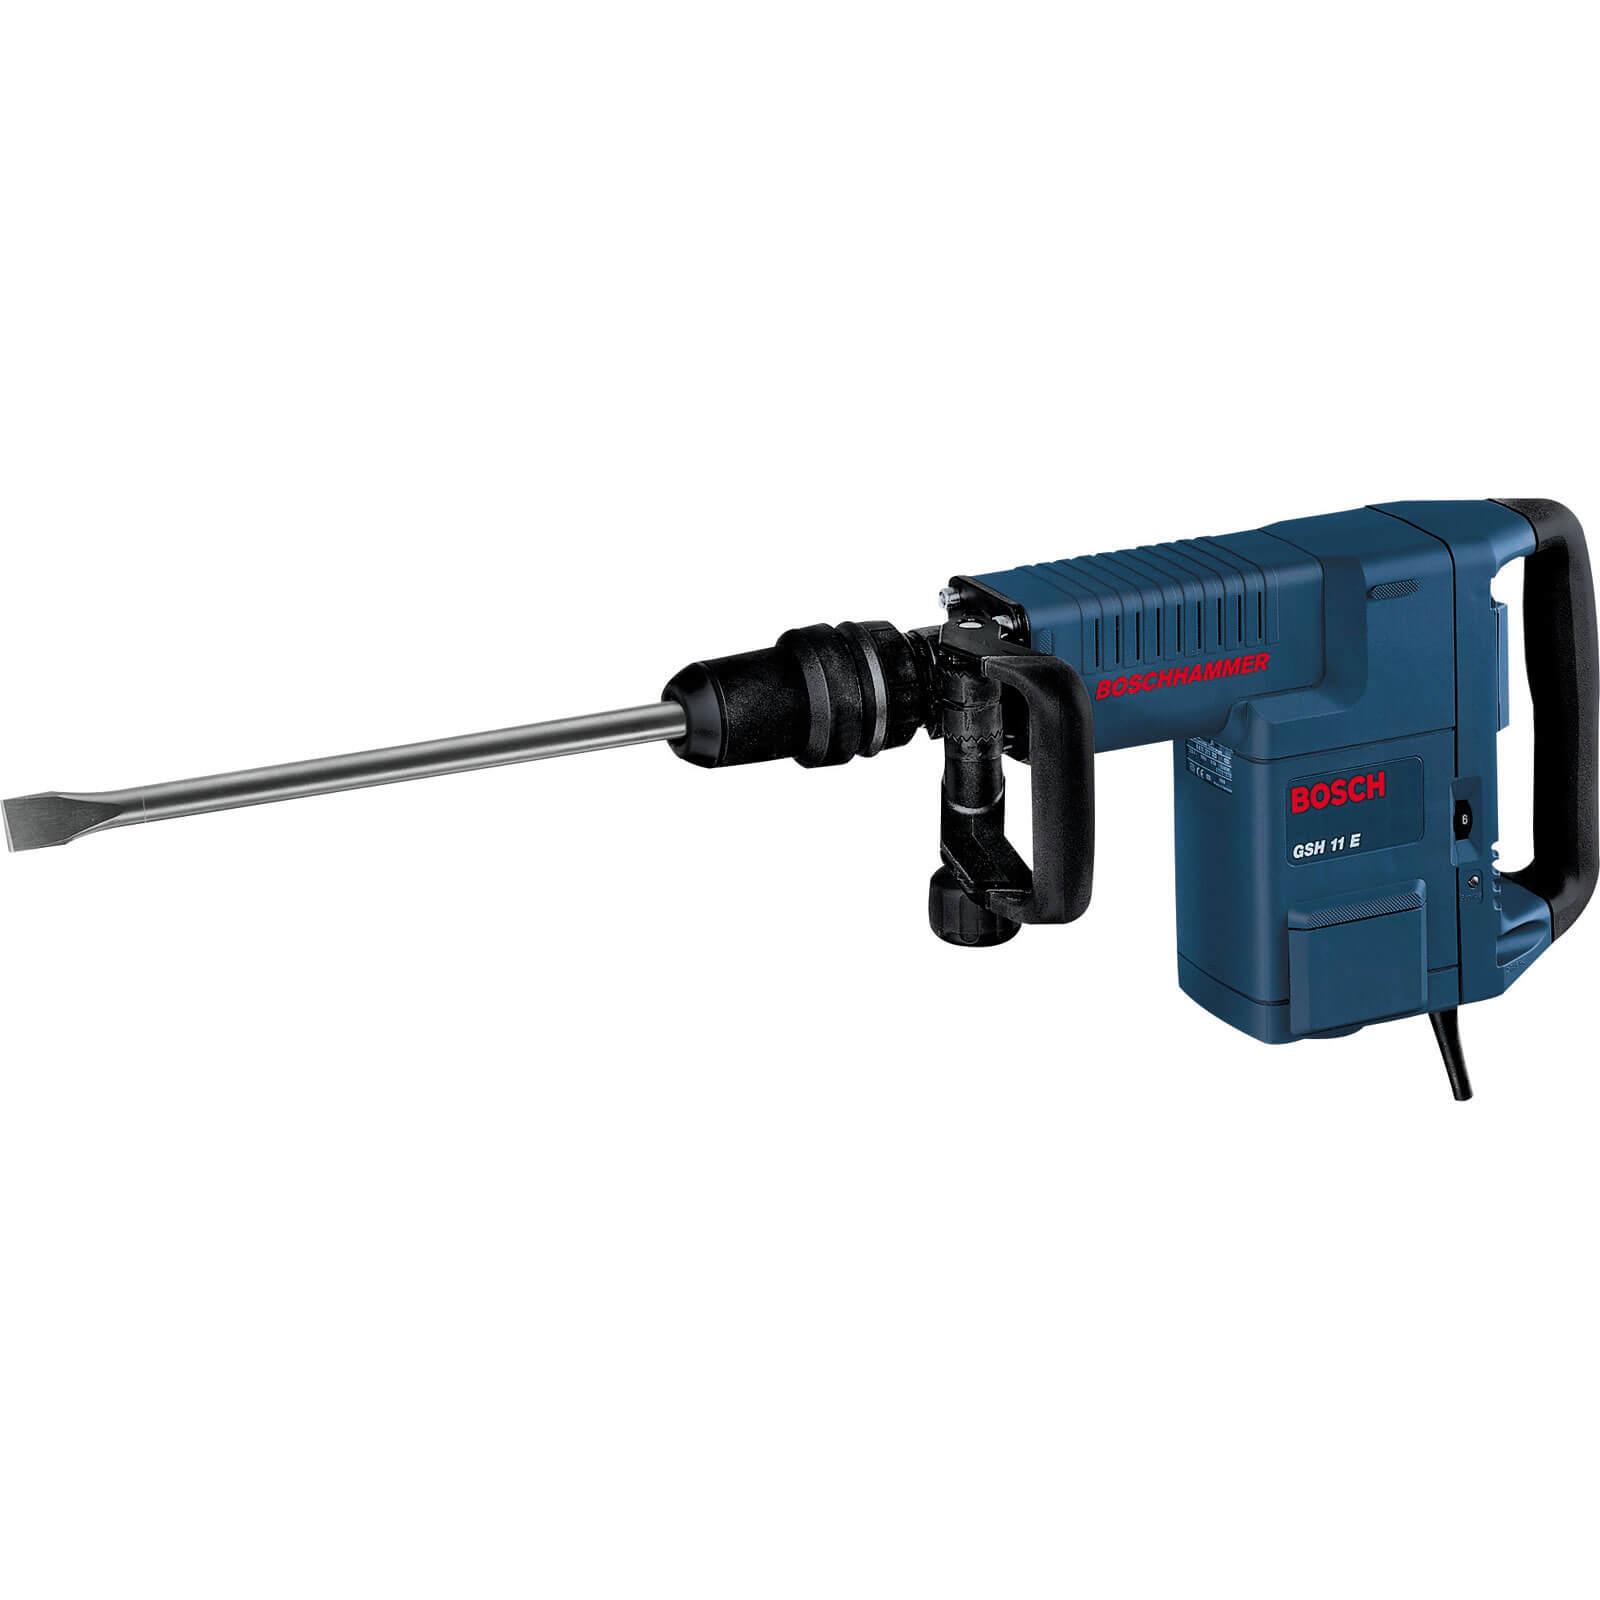 Image of Bosch GSH 11E SDS Max Demolition Hammer 110v